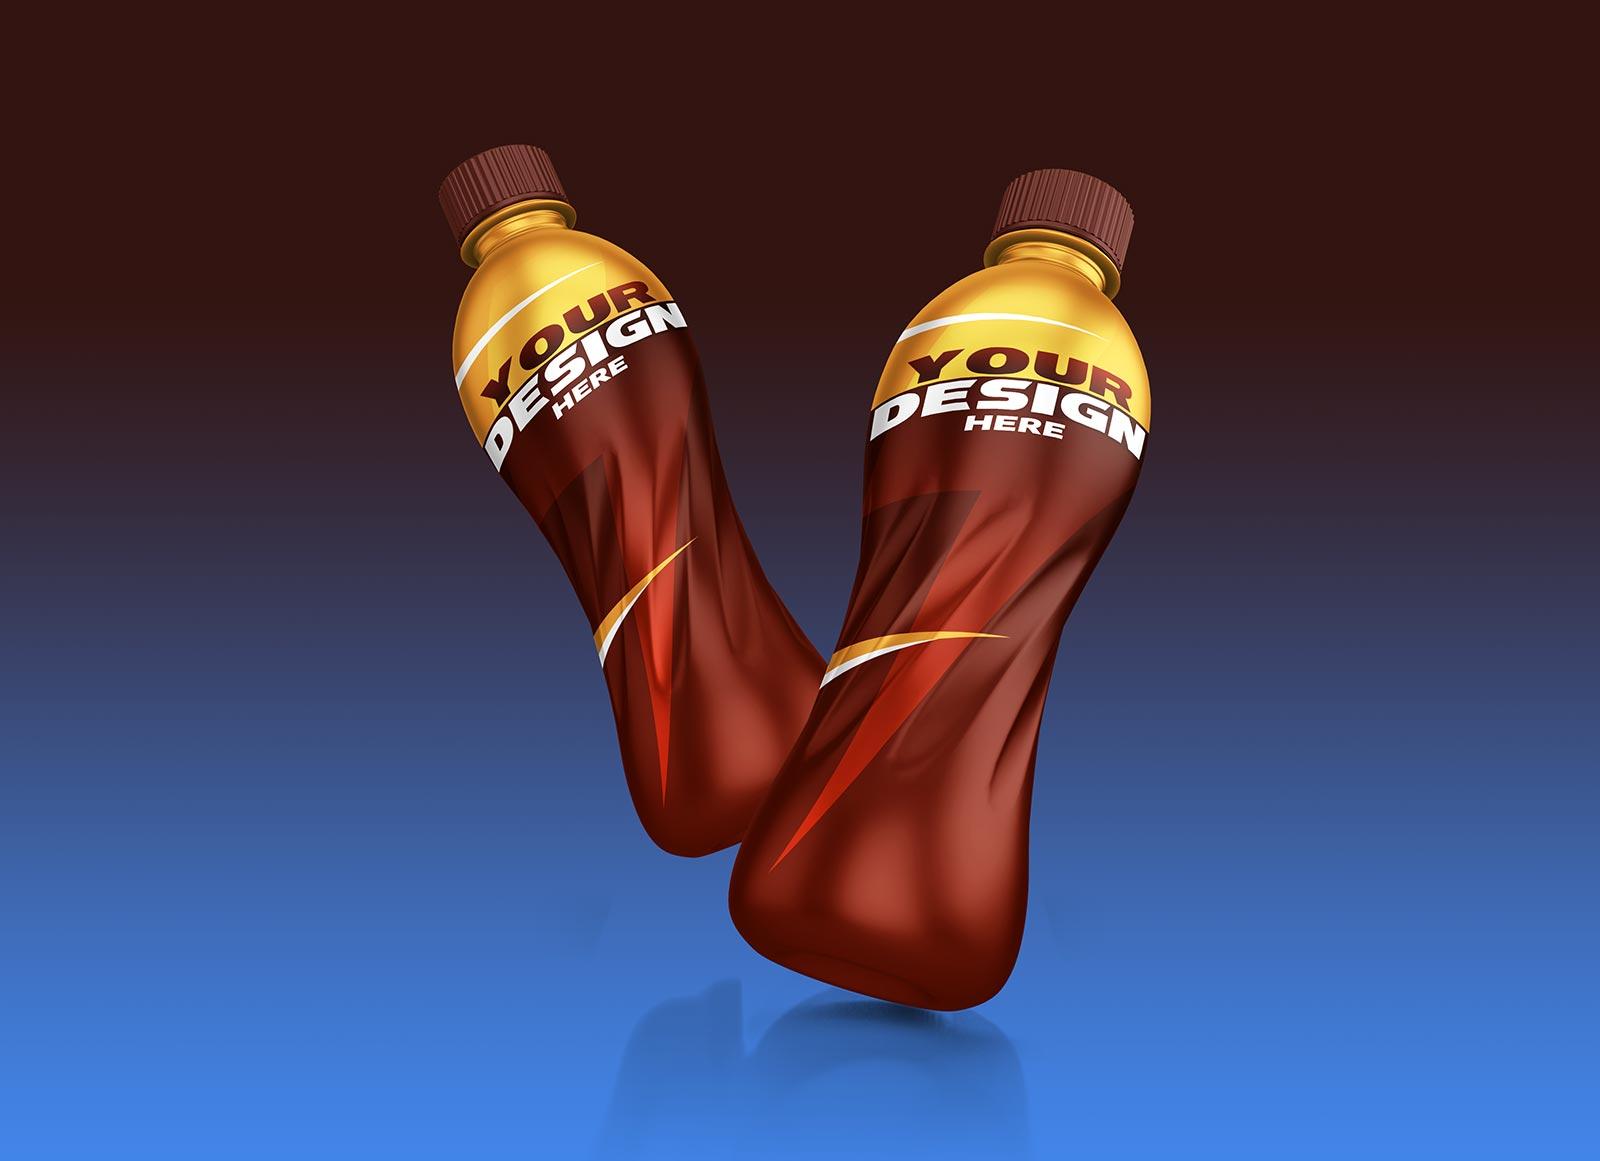 Free Energy Drink Bottle Mockup PSD